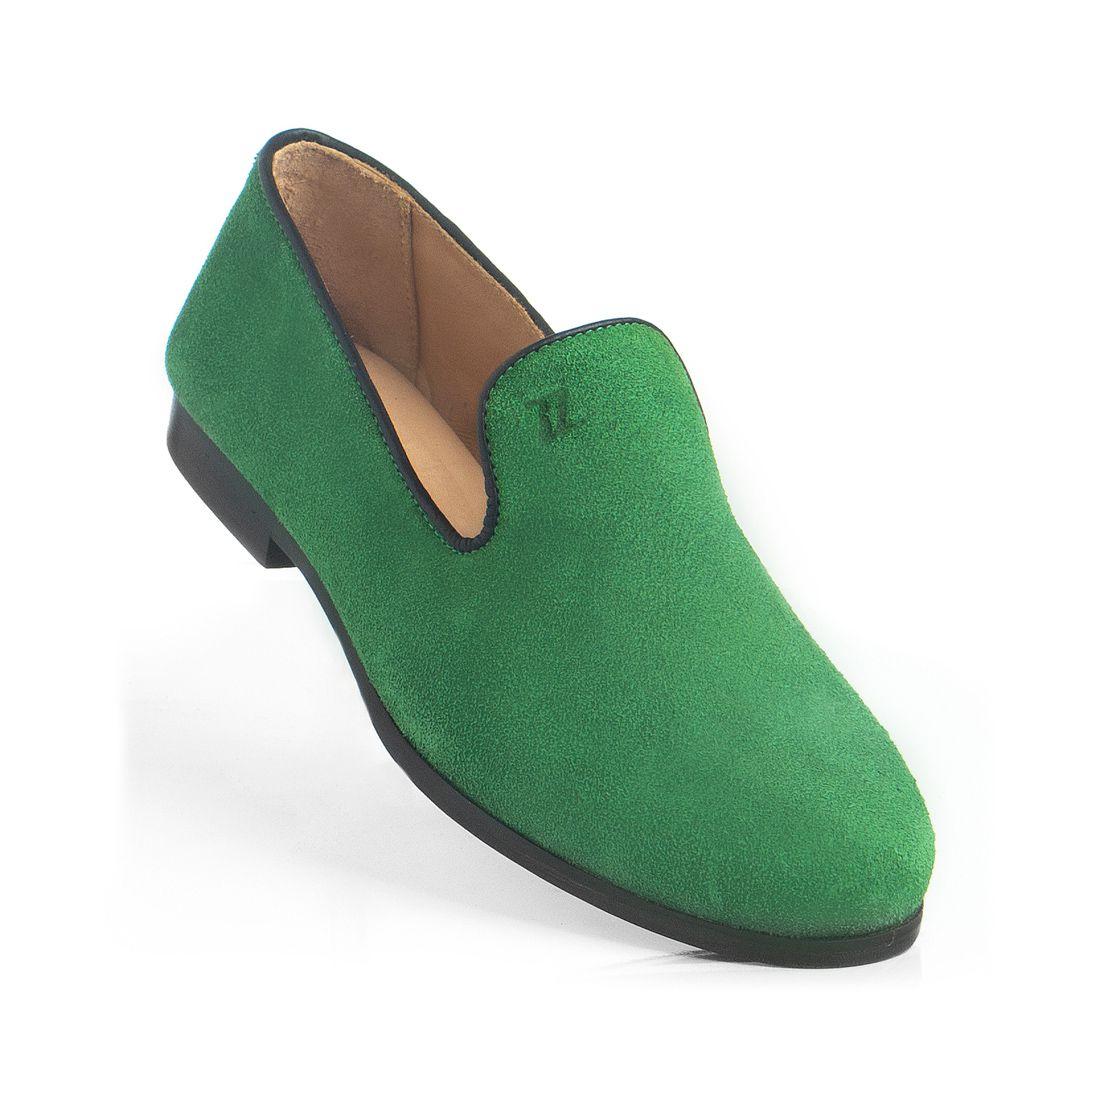 Loafer Masculino em Couro Camurça Verde Rocco Lorenzzo - 4520